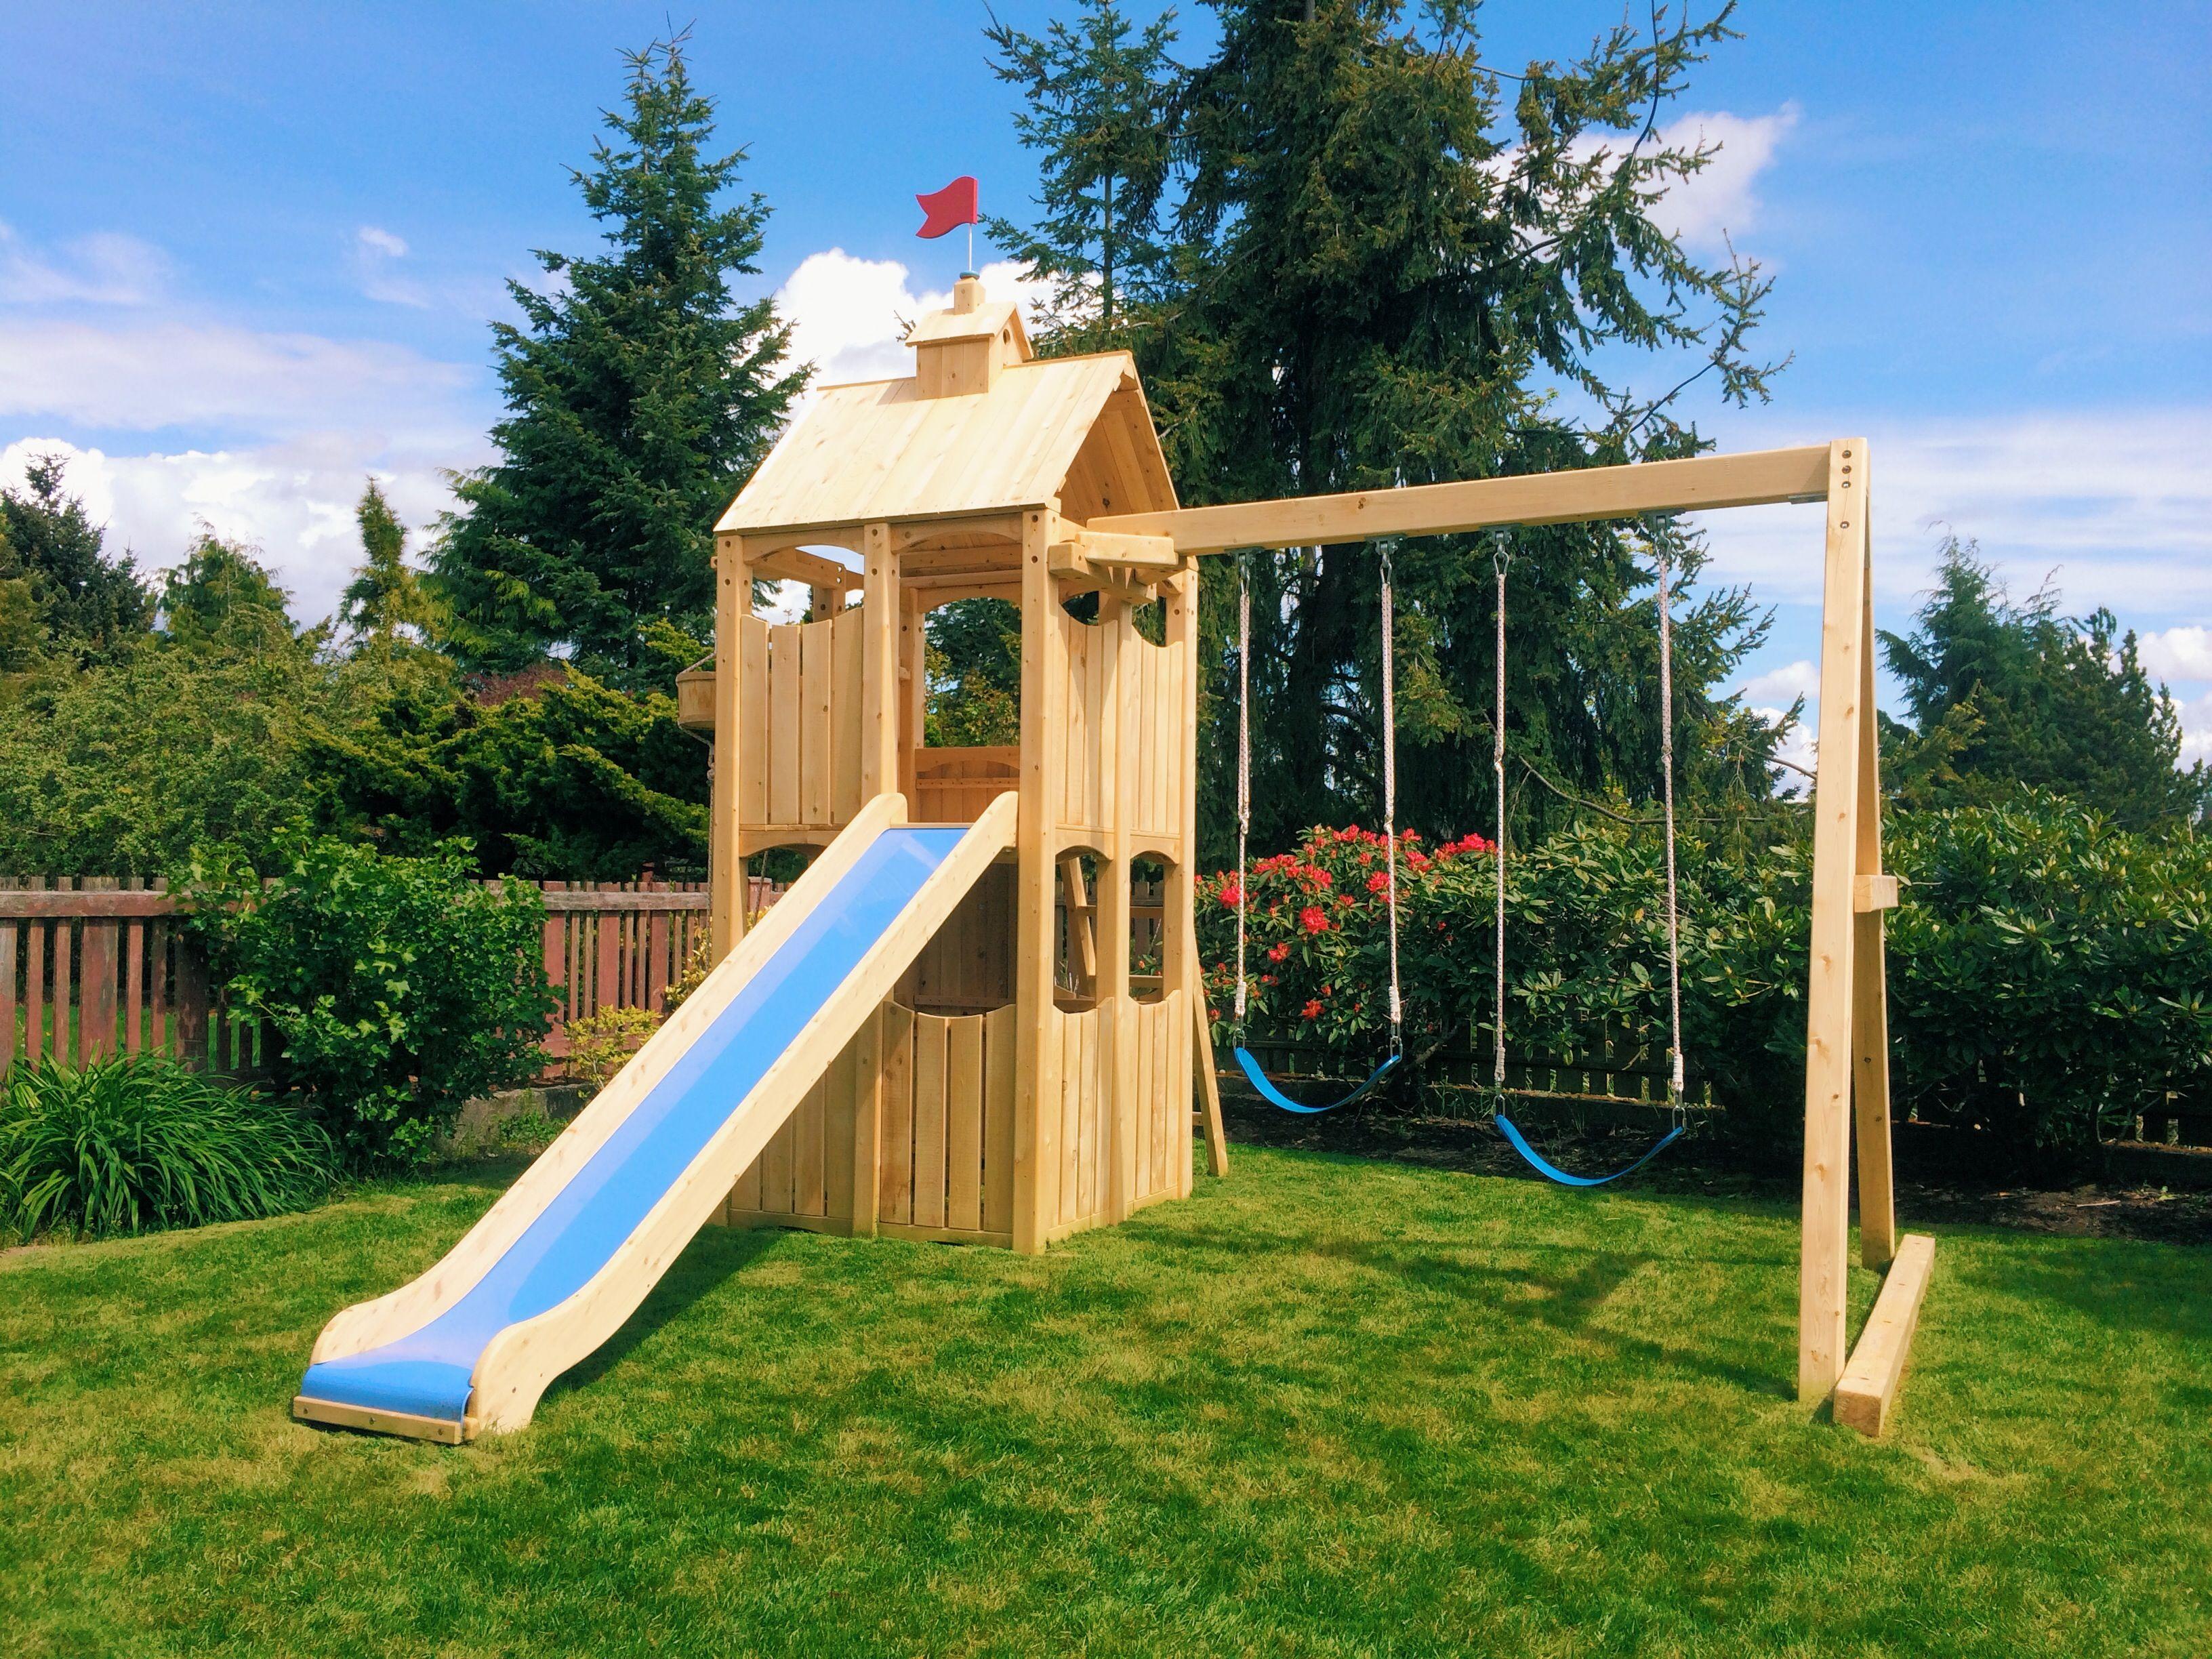 Pin By Chad Syme On Kids Small Backyard Landscaping Backyard Playset Small Backyard